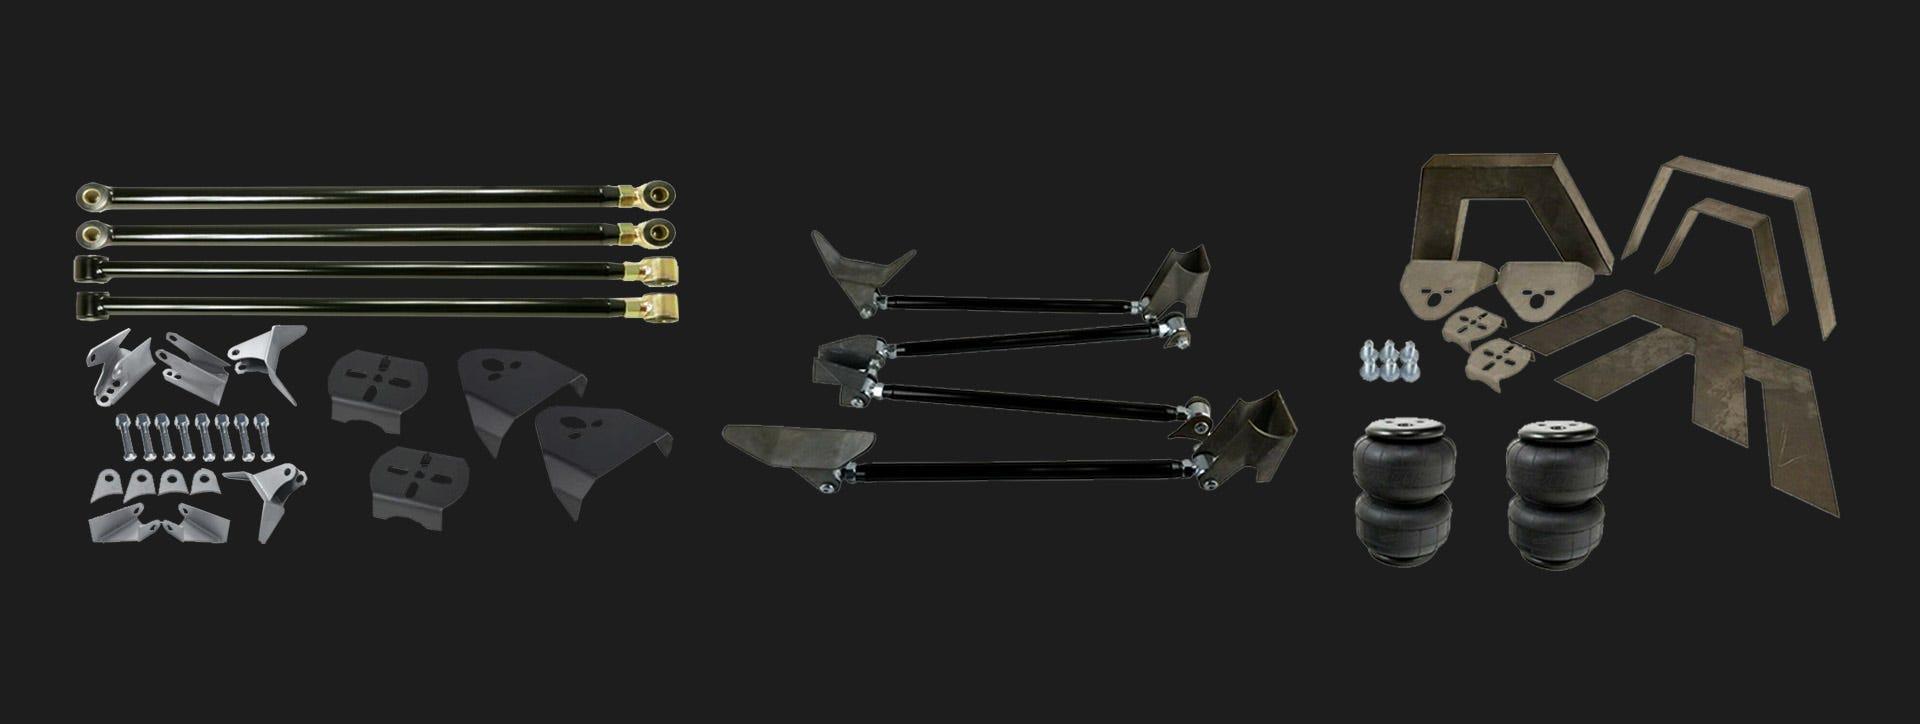 4 Link Suspension Parts & Kits